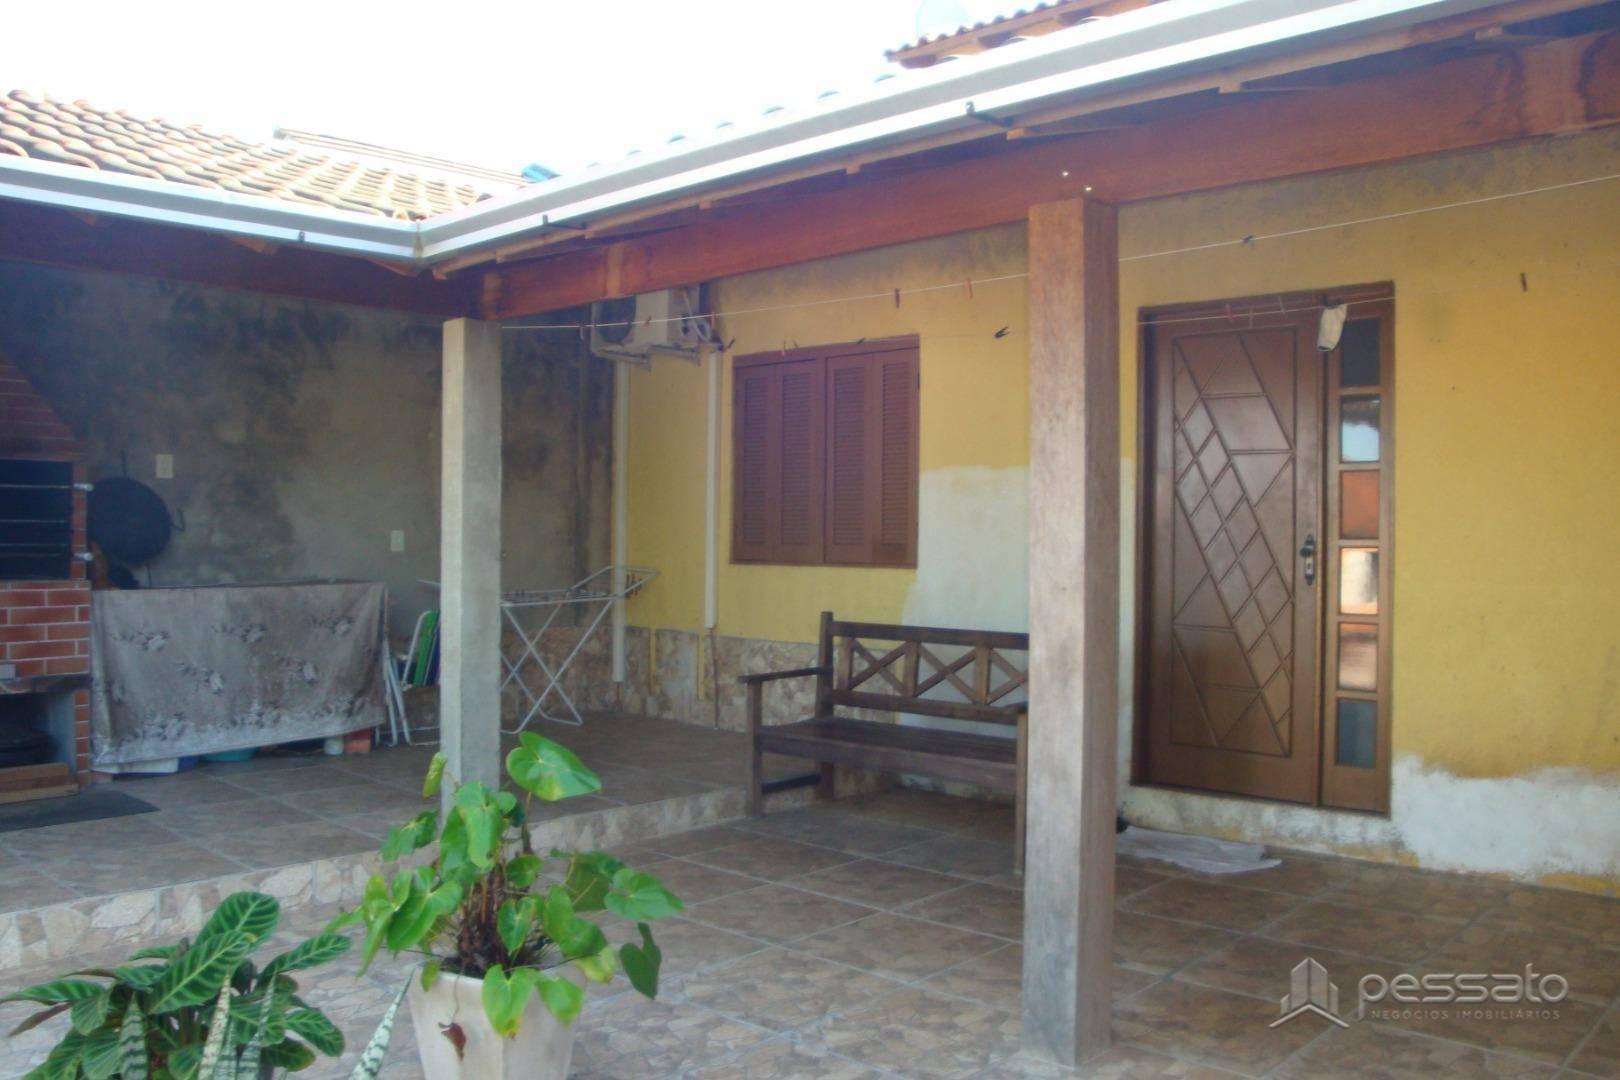 casa 2 dormitórios em Gravataí, no bairro Loteamento Jardim Timbaúva